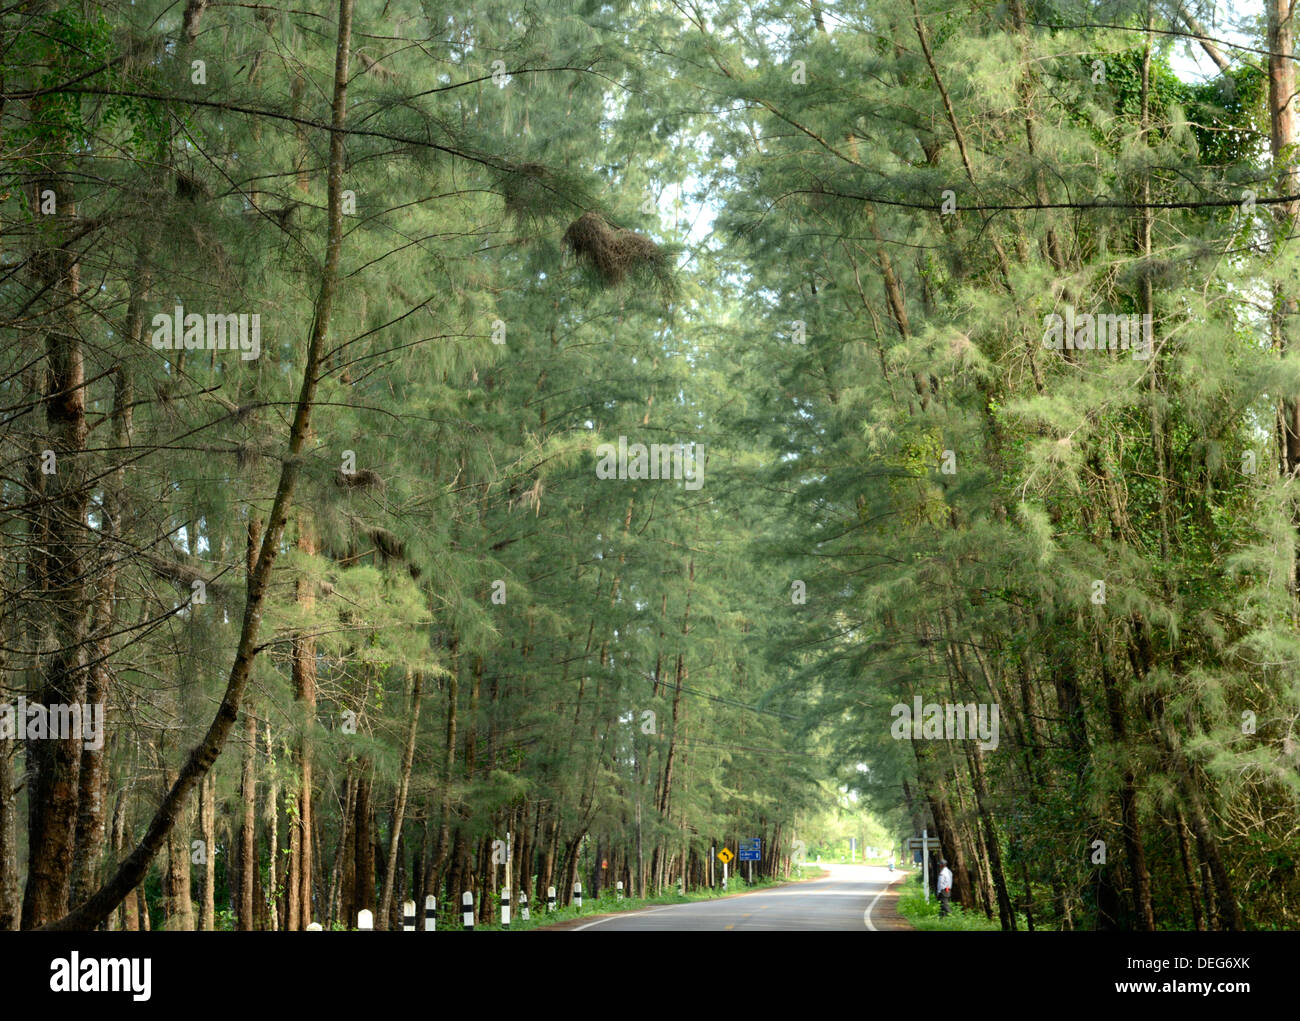 Avenue lined with casuarina tree, Si Kao, Trang, Thailand, Southeast Asia, Asia - Stock Image